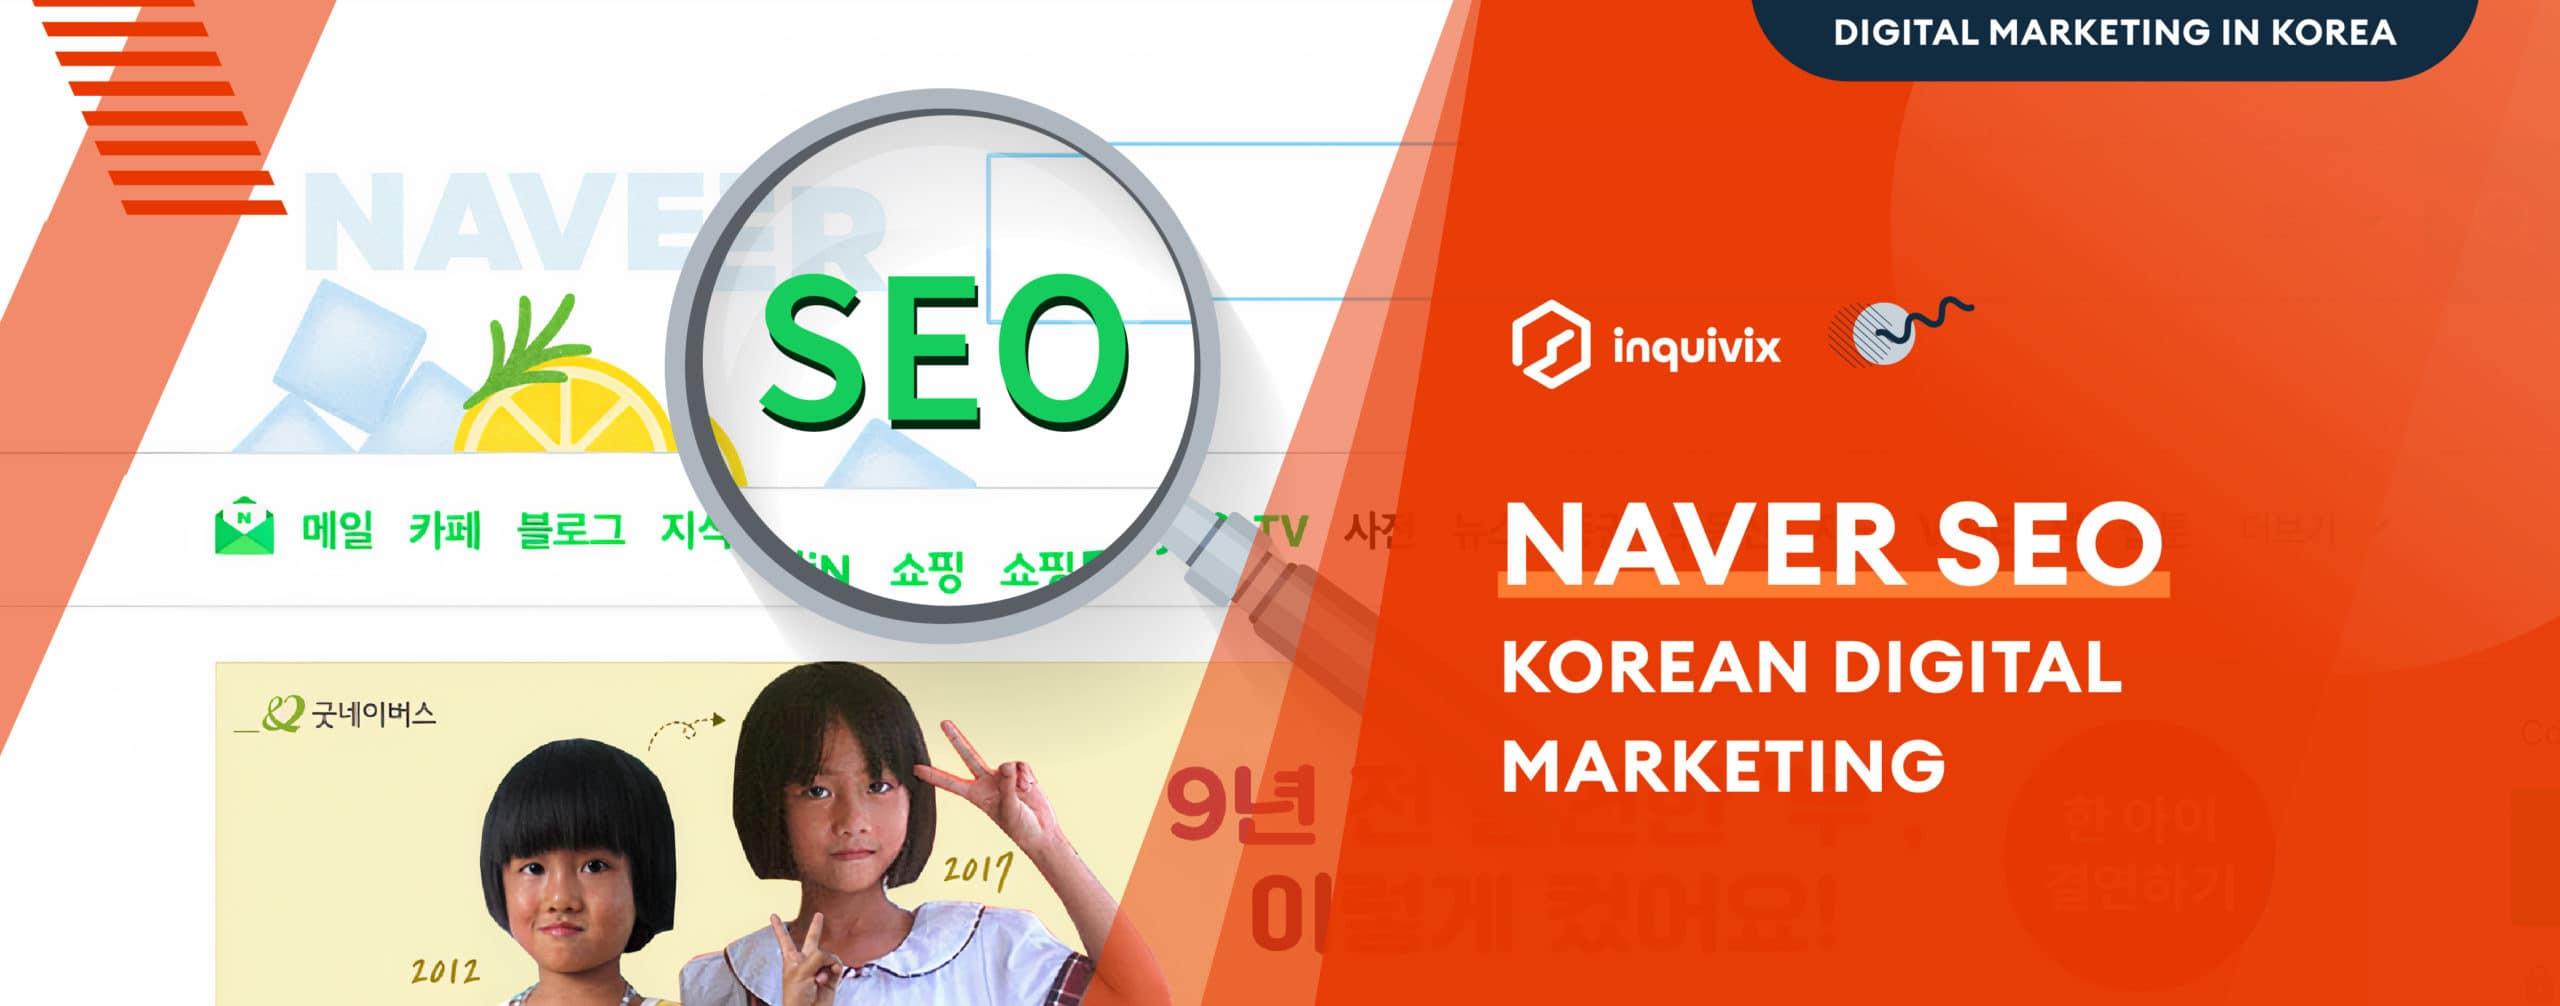 Naver SEO - Korean Digital Marketing